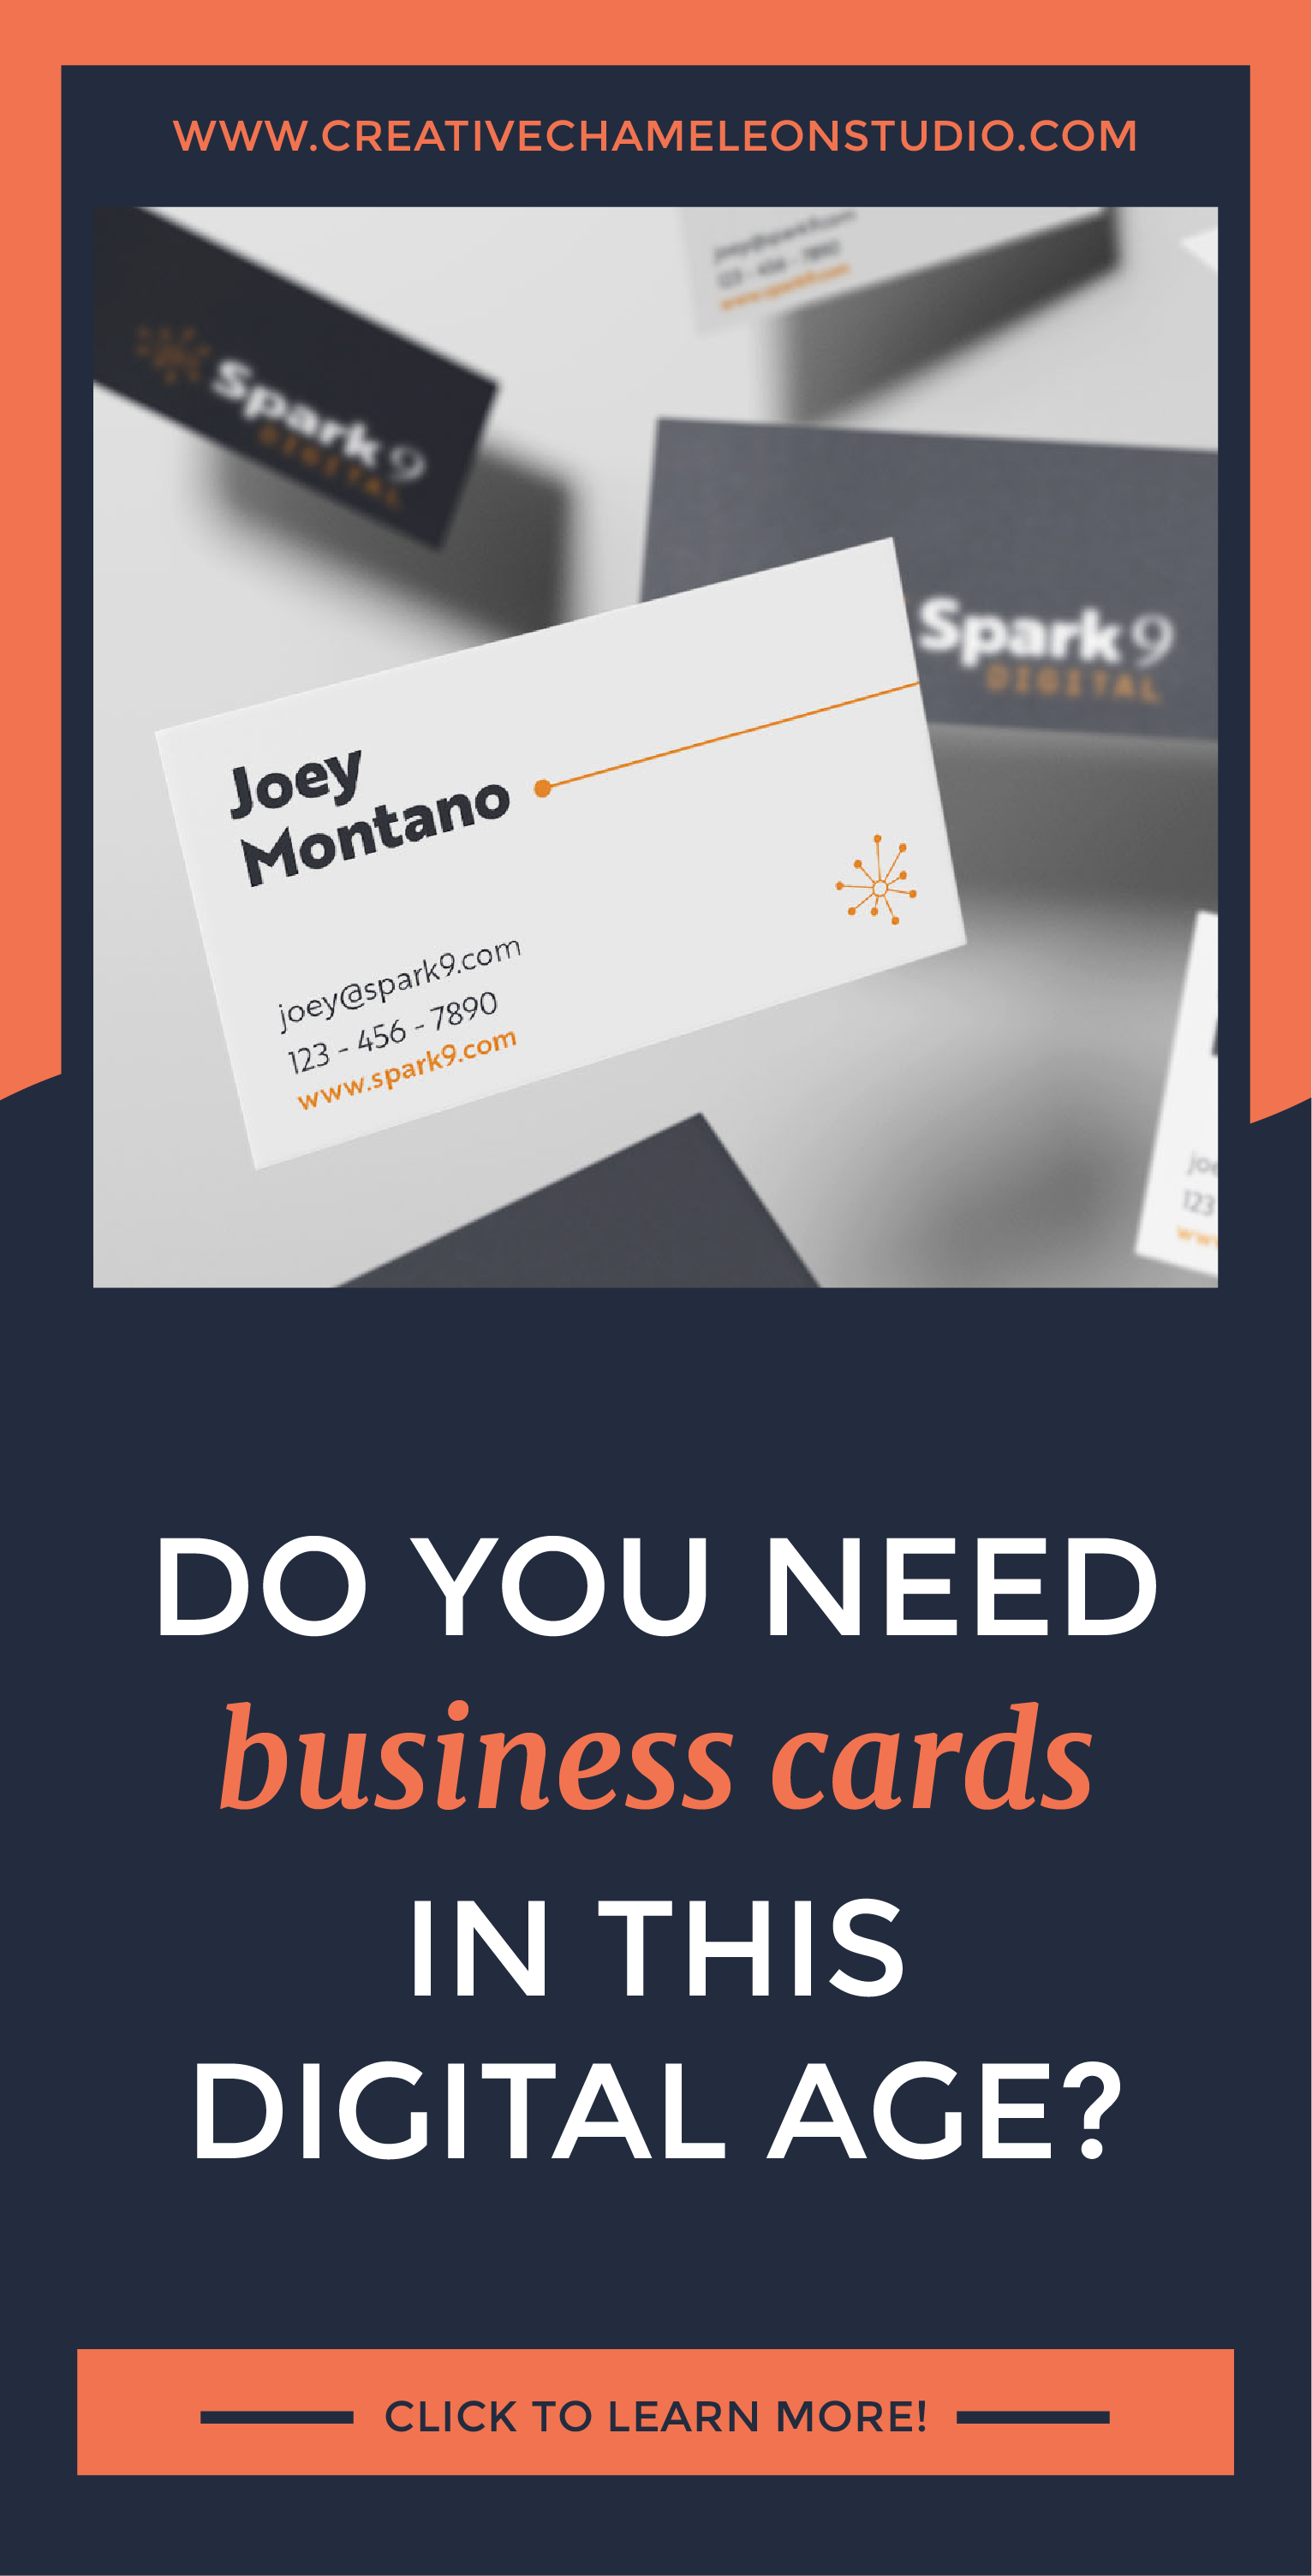 Do Business Cards Still Matter In The Digital Age Pinterest For Business Branding Advice Blog Traffic